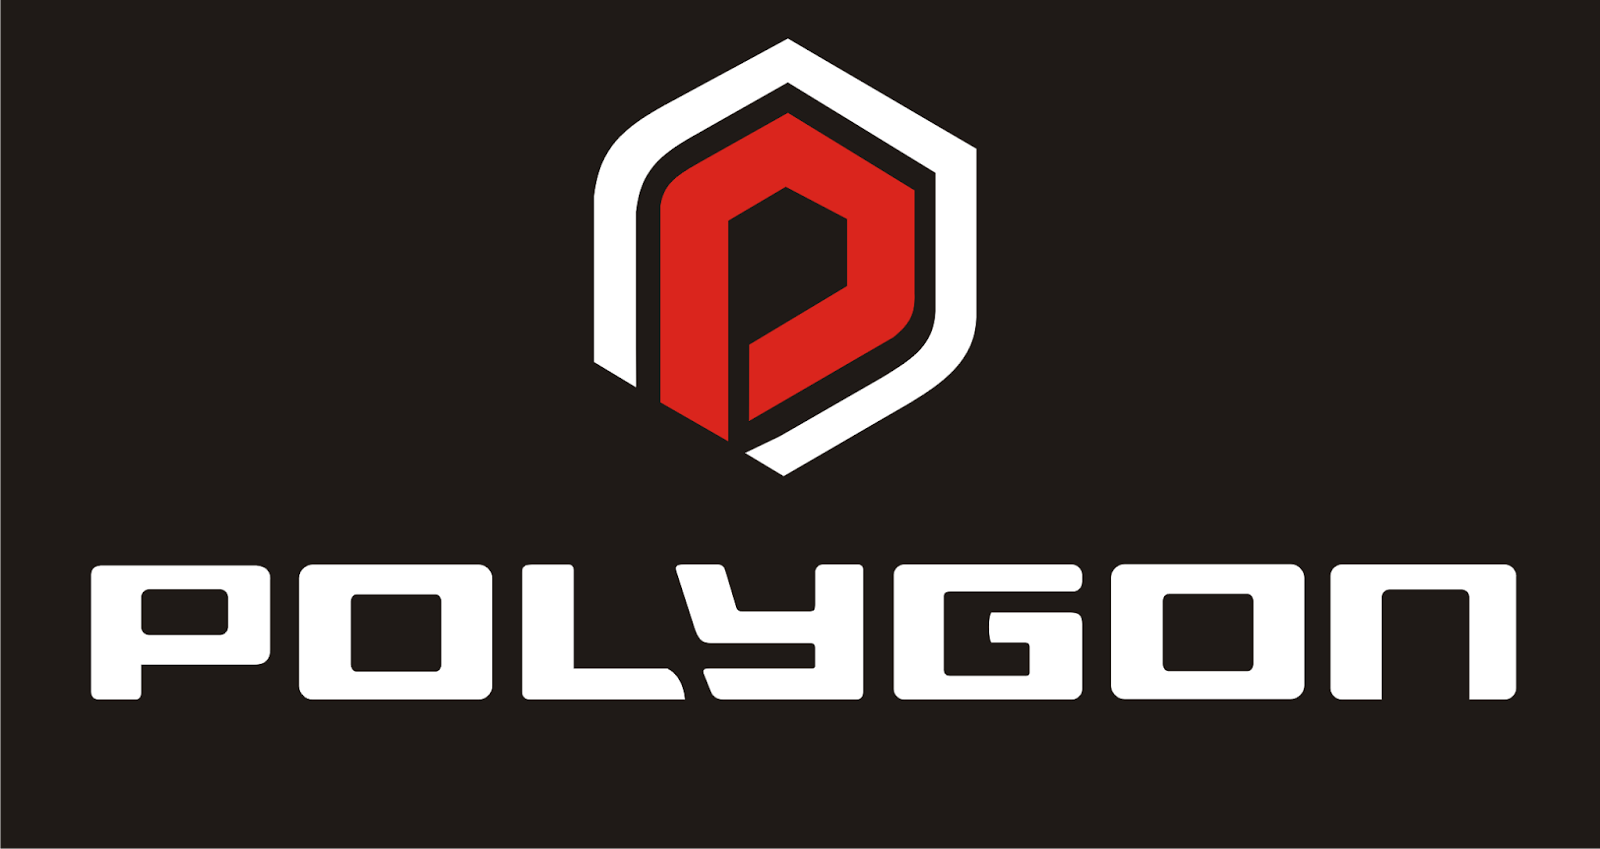 logo baru sepeda polygon 2014 logo lambang indonesia